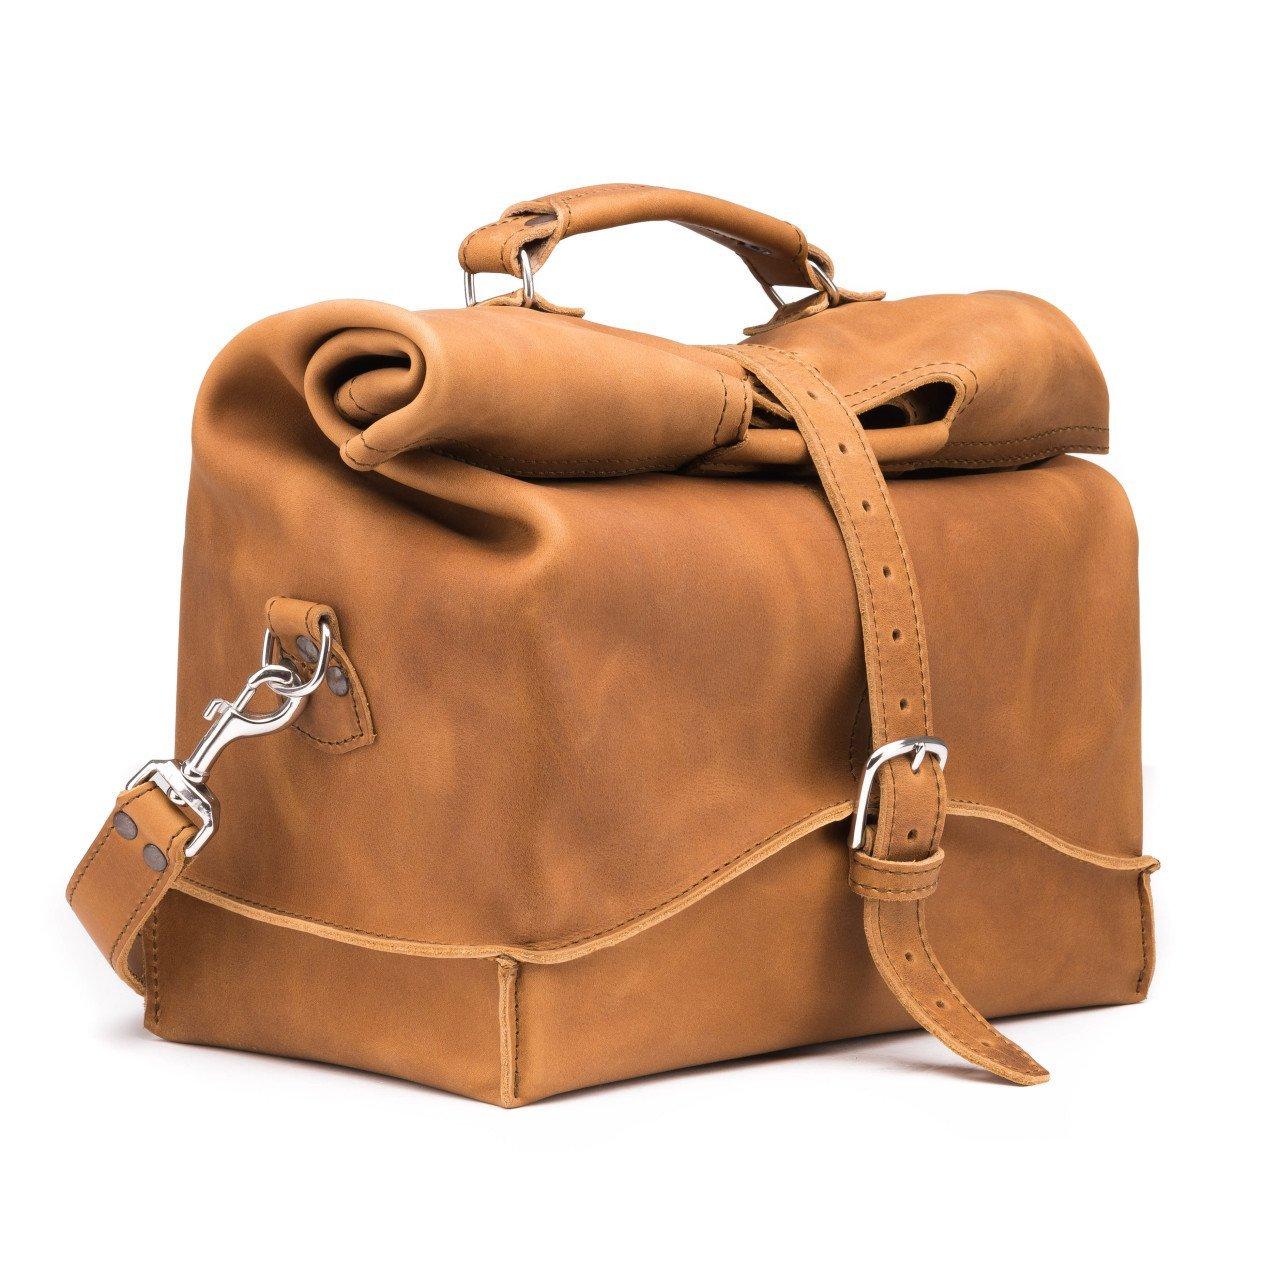 Saddleback Leather Overnight Bag - Full Grain Leather Carry On - 100 Year Warranty